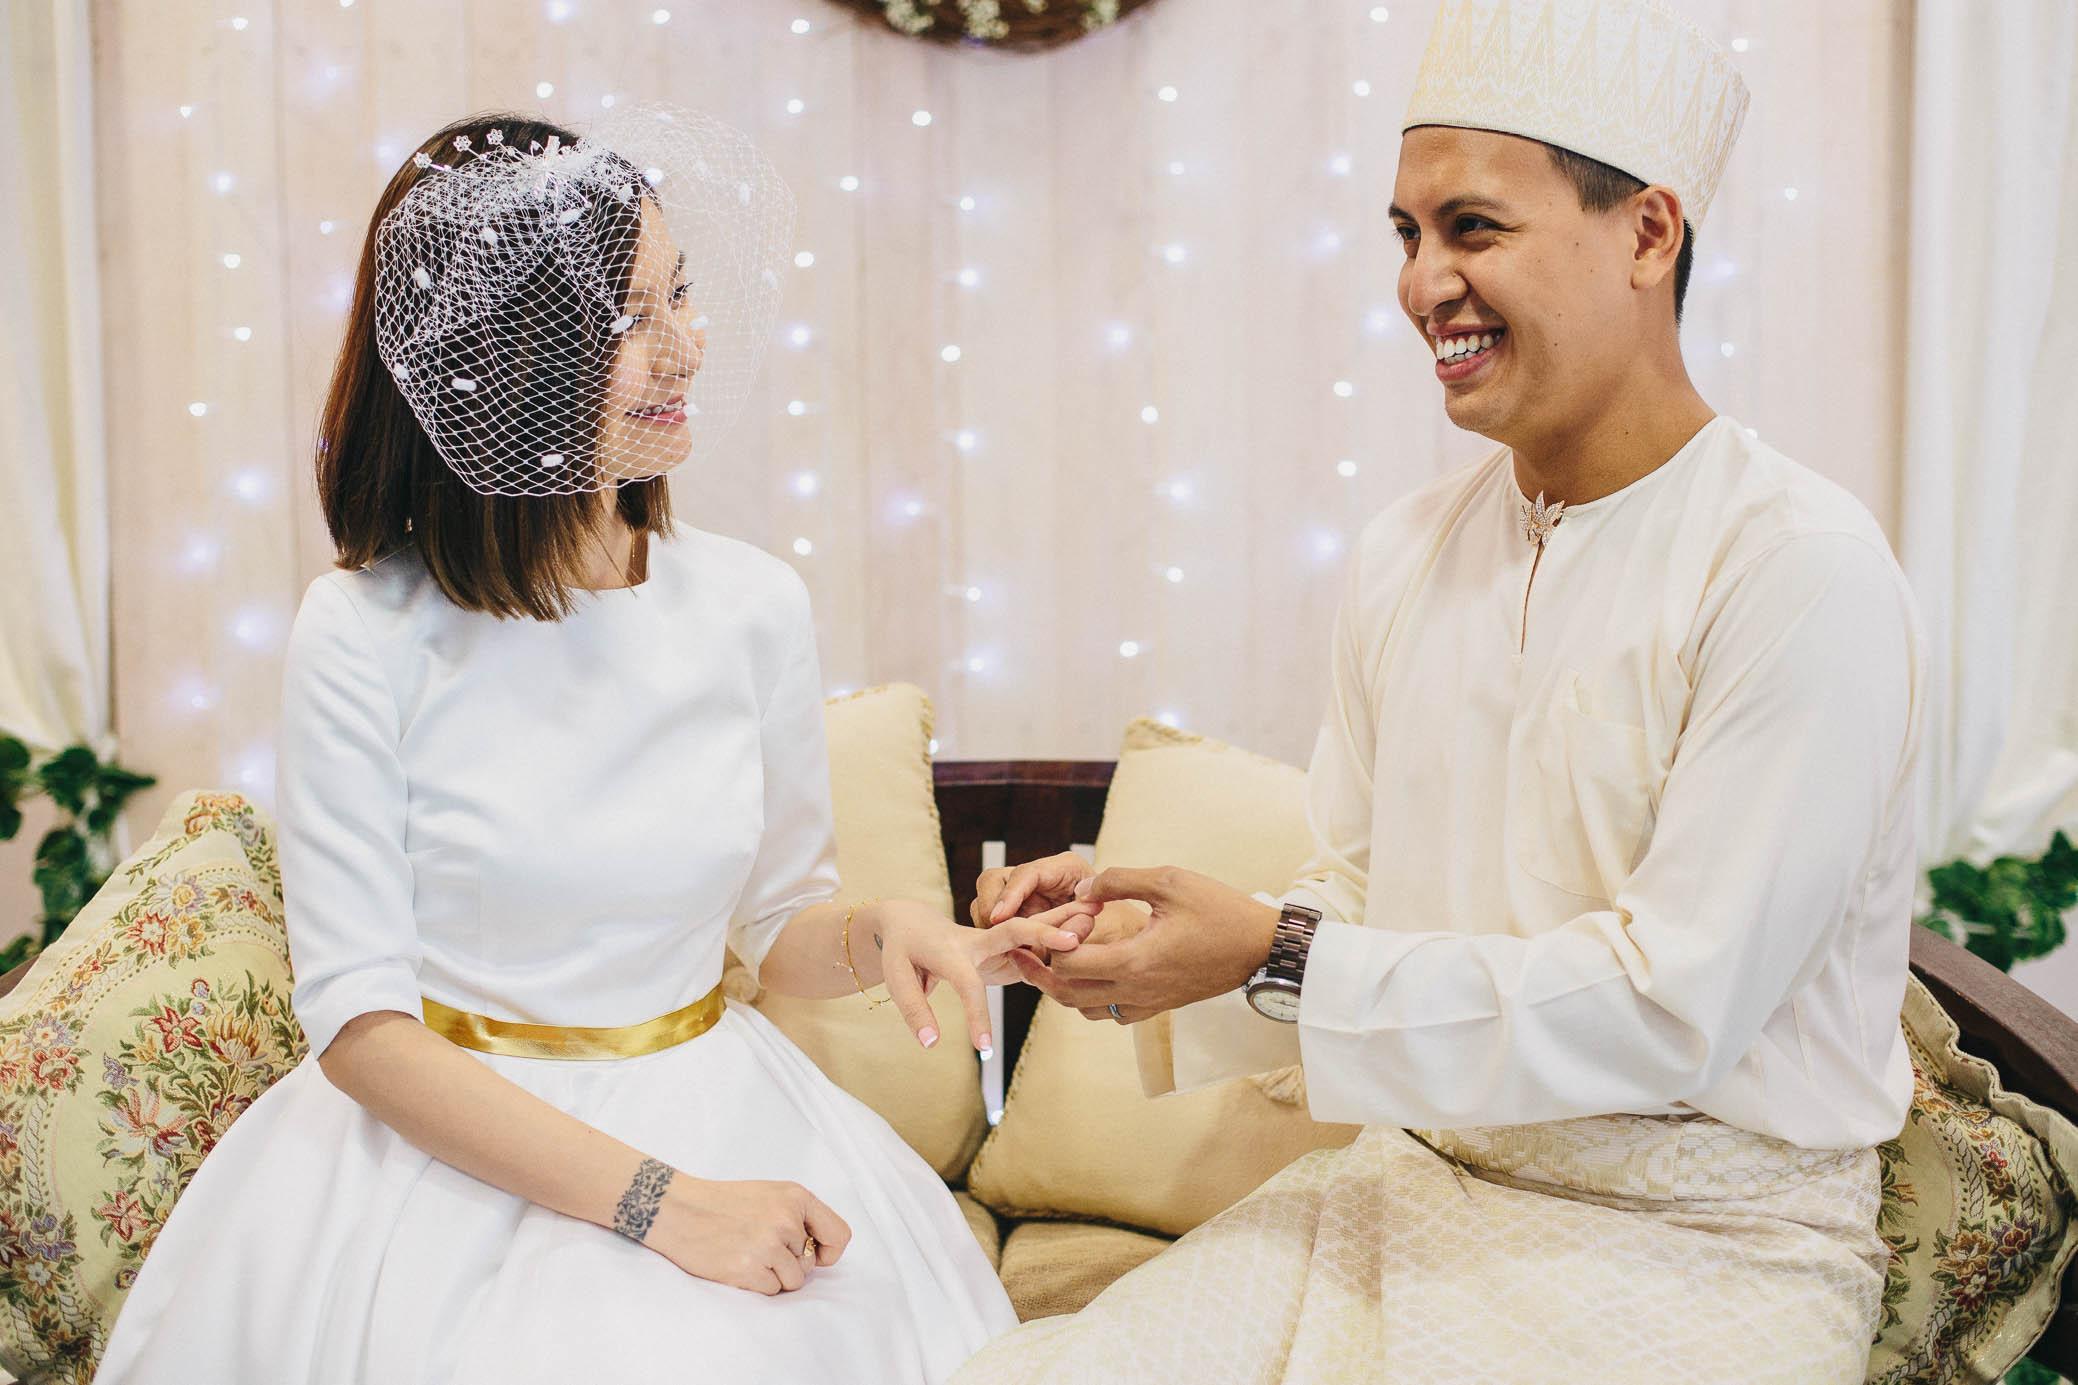 singapore-wedding-photographer-malay-indian-pre-wedding-travel-wmt-2015-alif-ethel-35.jpg